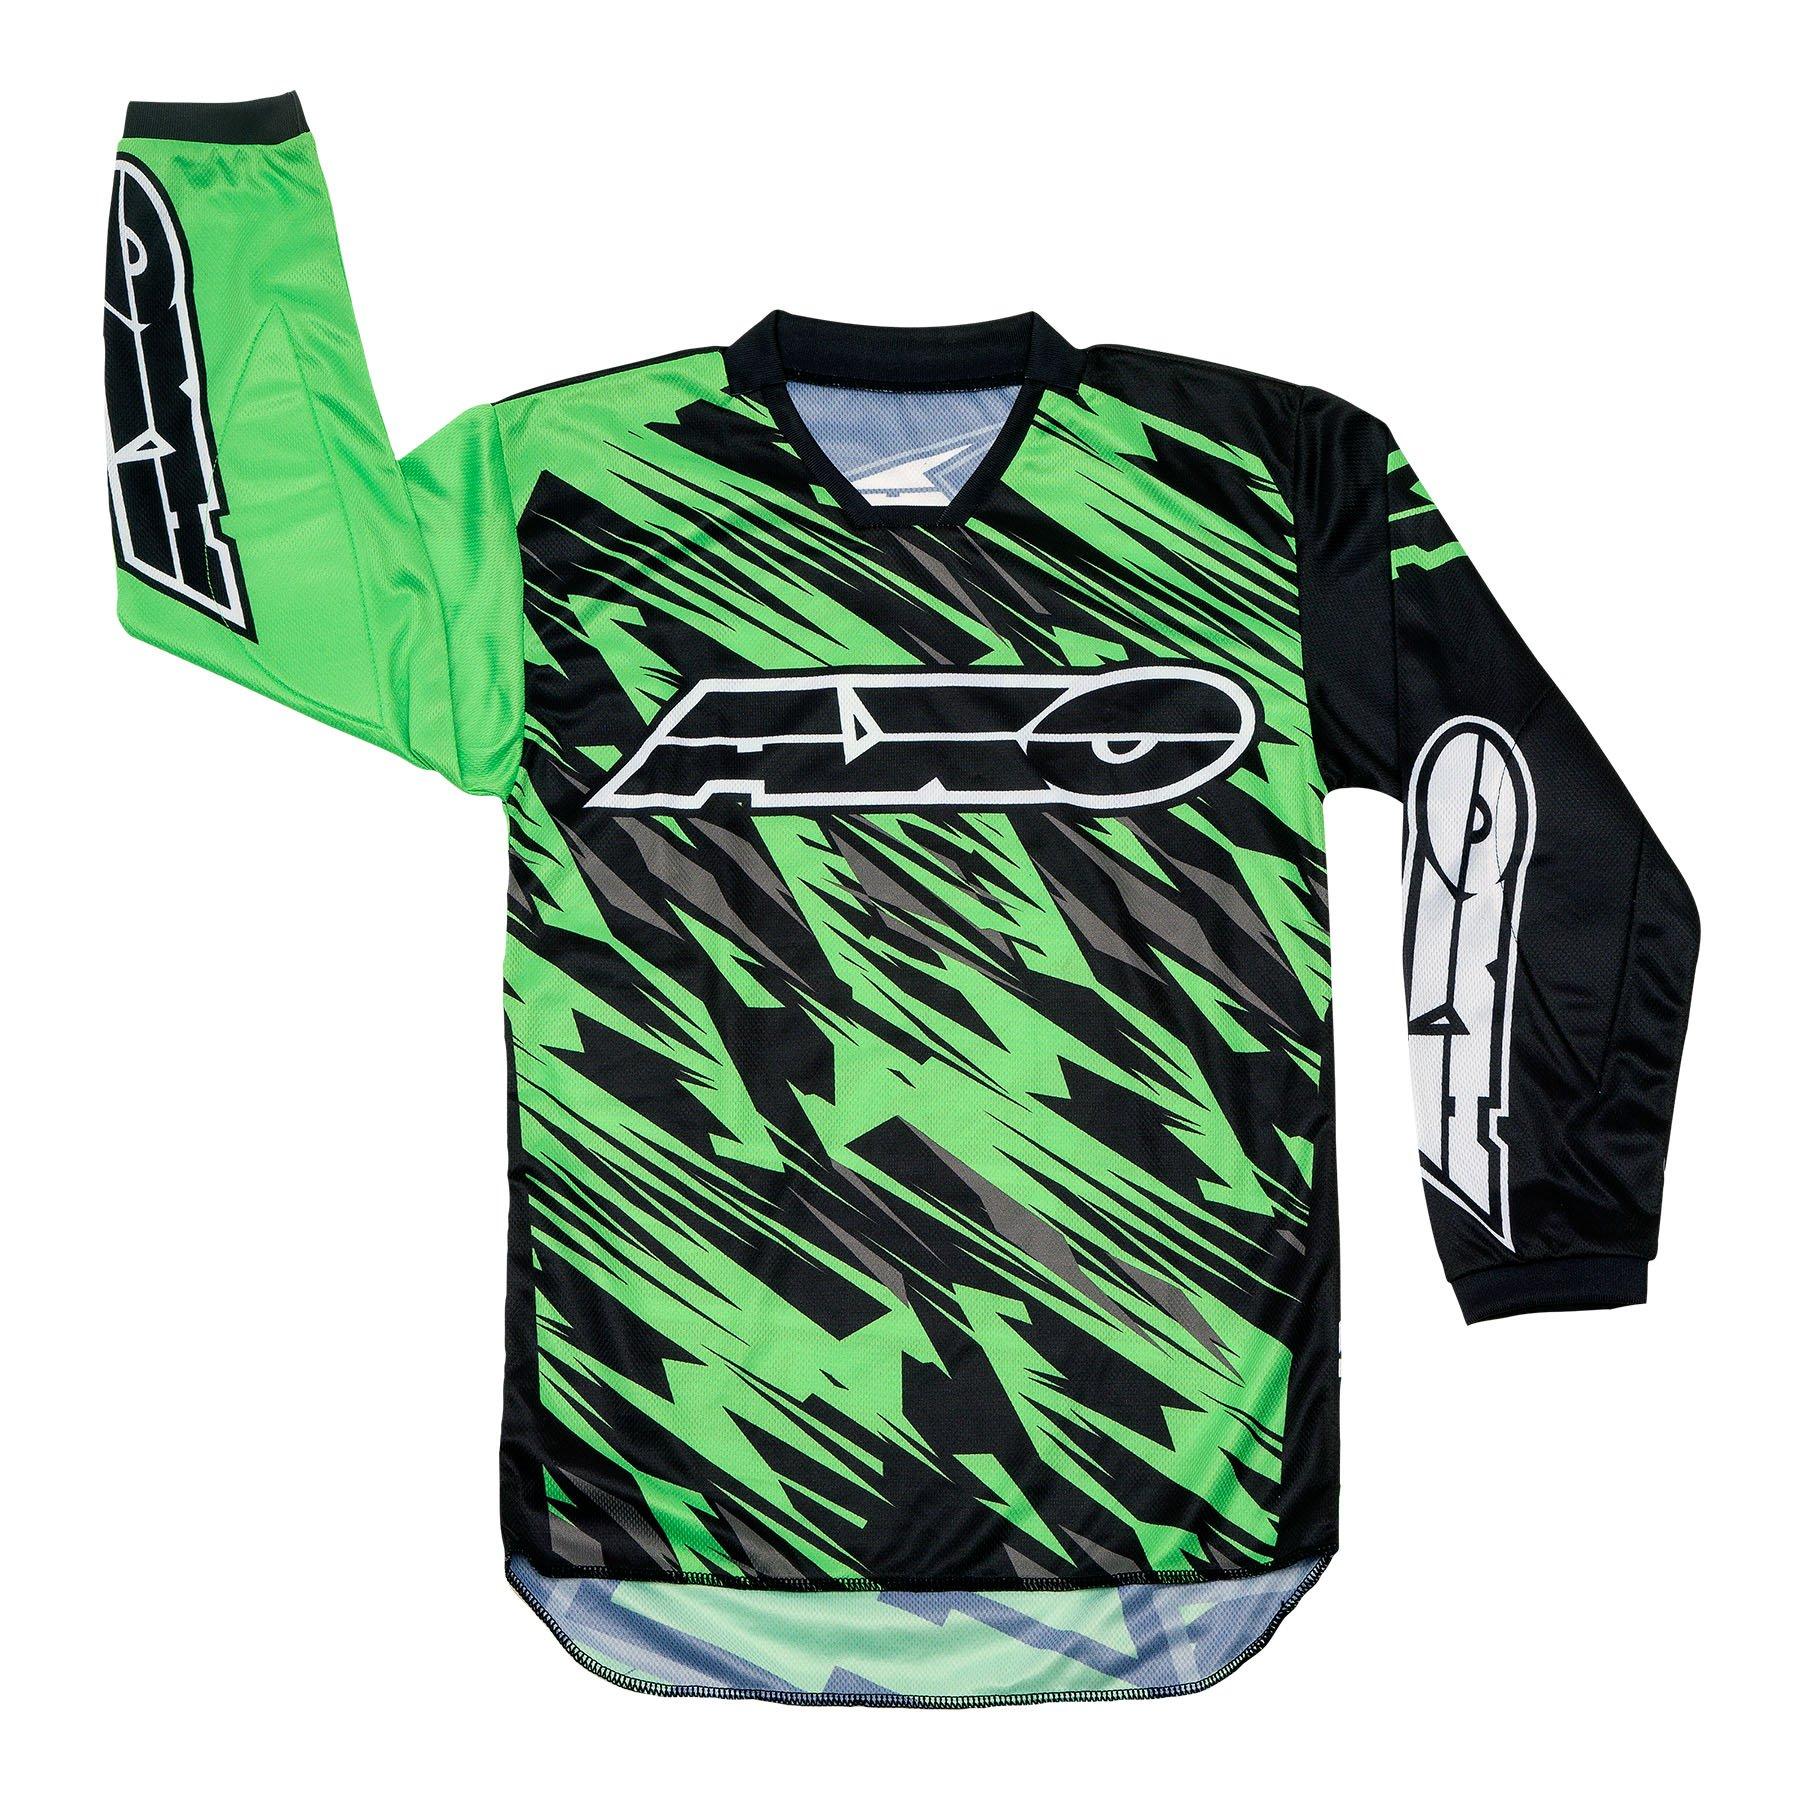 AXO Prodigy Junior Jersey (Black/Fluorescent Green, X-Large)